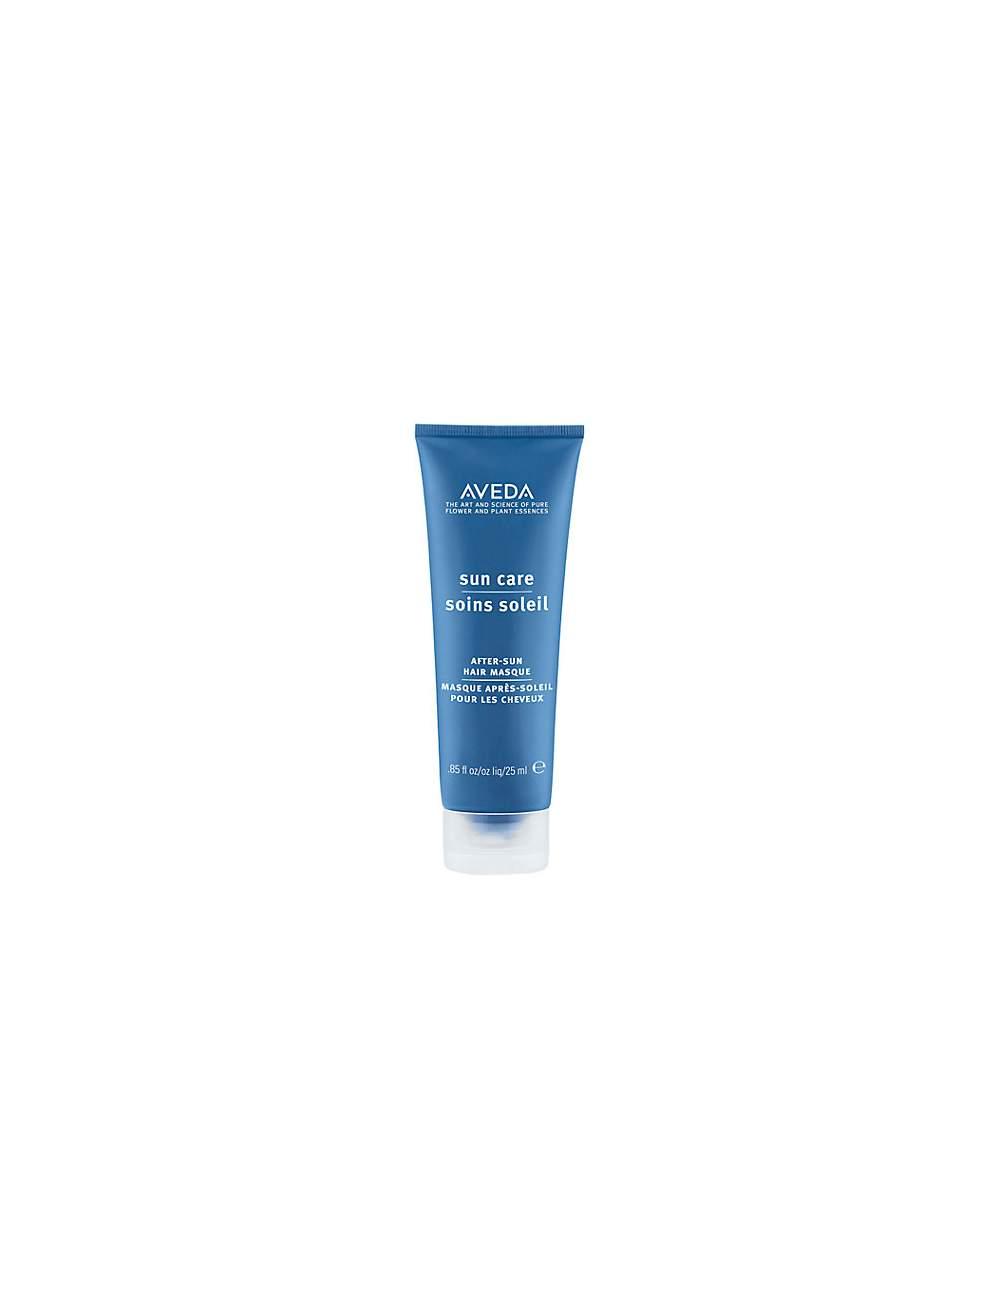 Aveda Suncare Treatment Masque 125ml